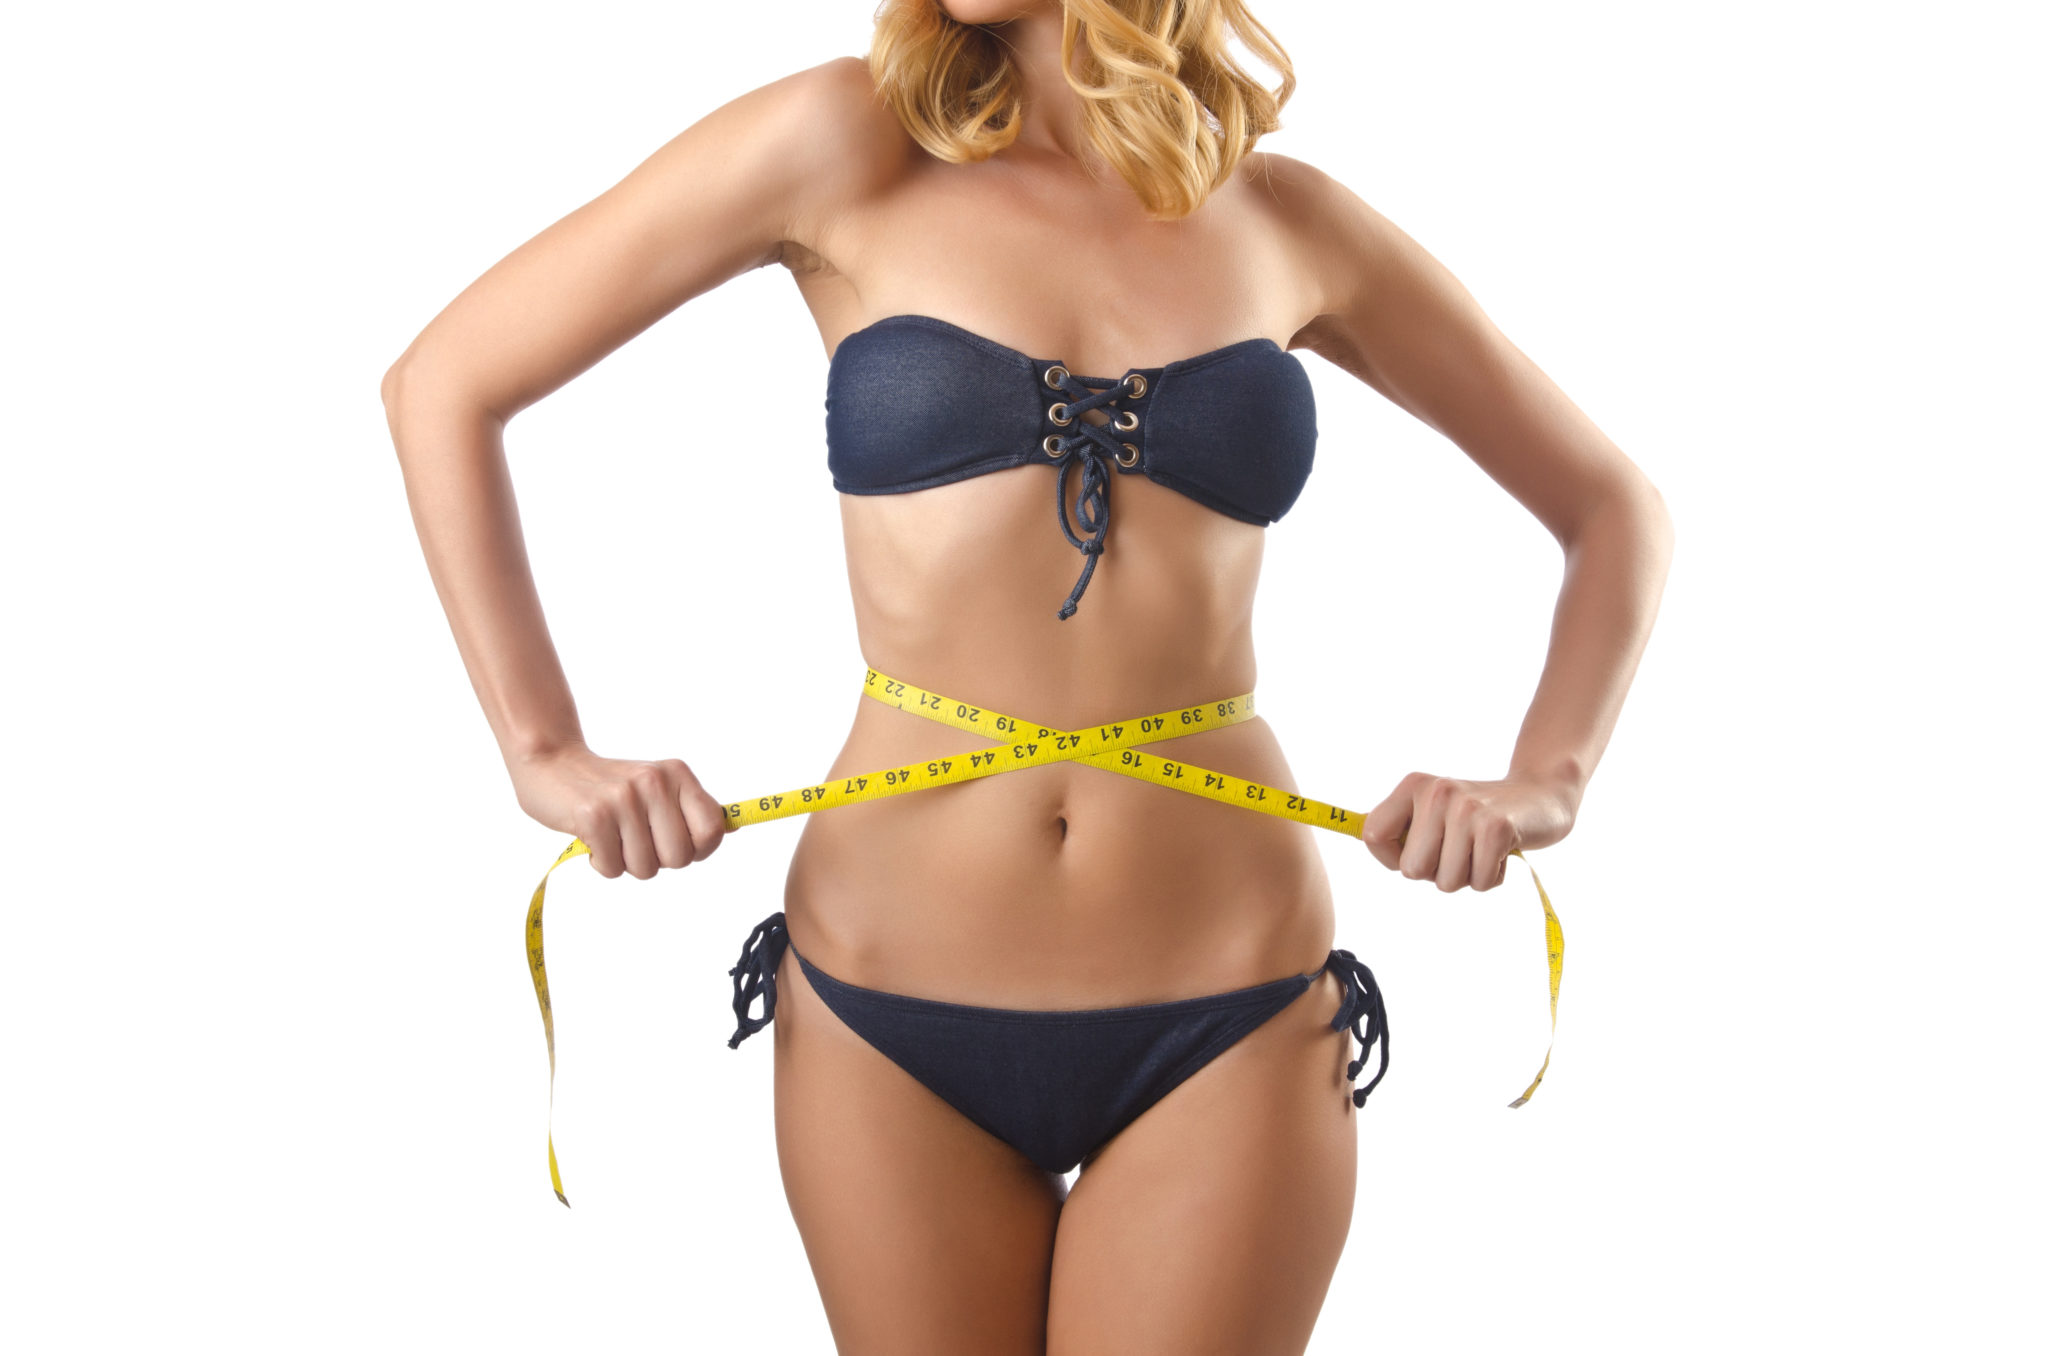 afvallen, metabolisme versnellen, vet verbranden, krachttraining